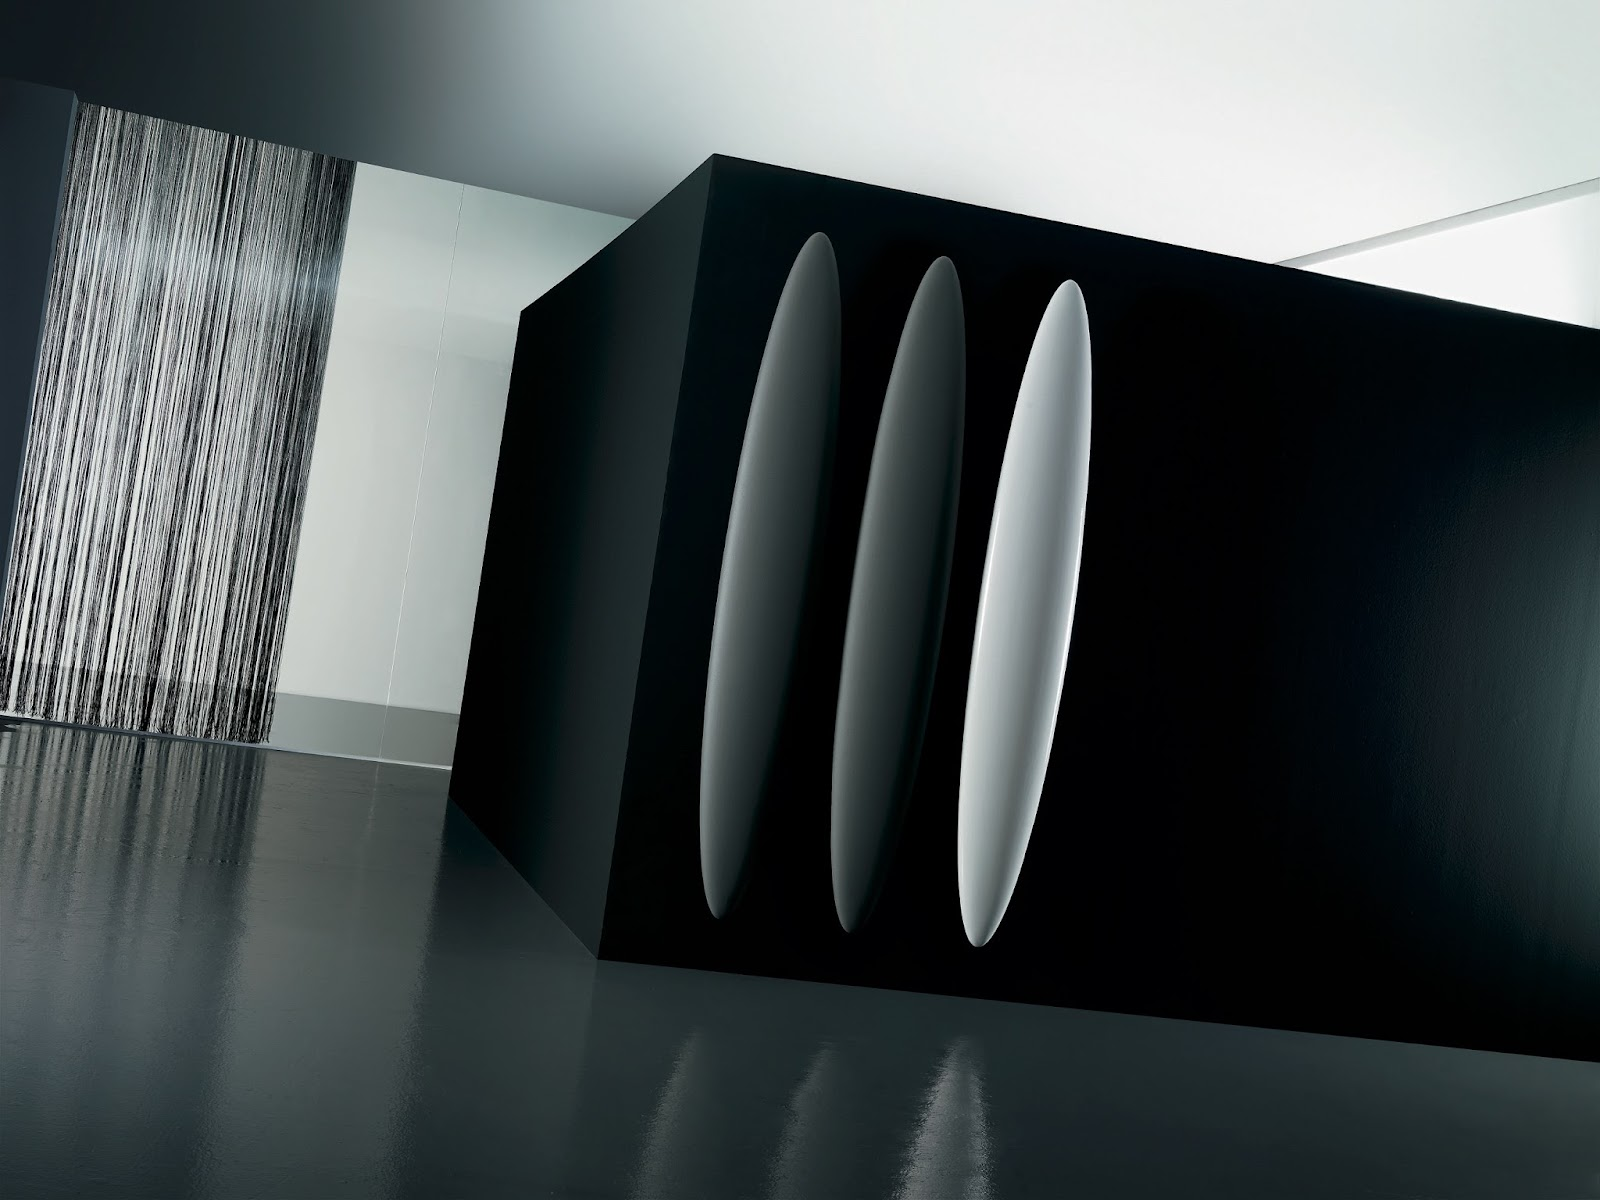 antrax-radiatory-blade 1.jpg